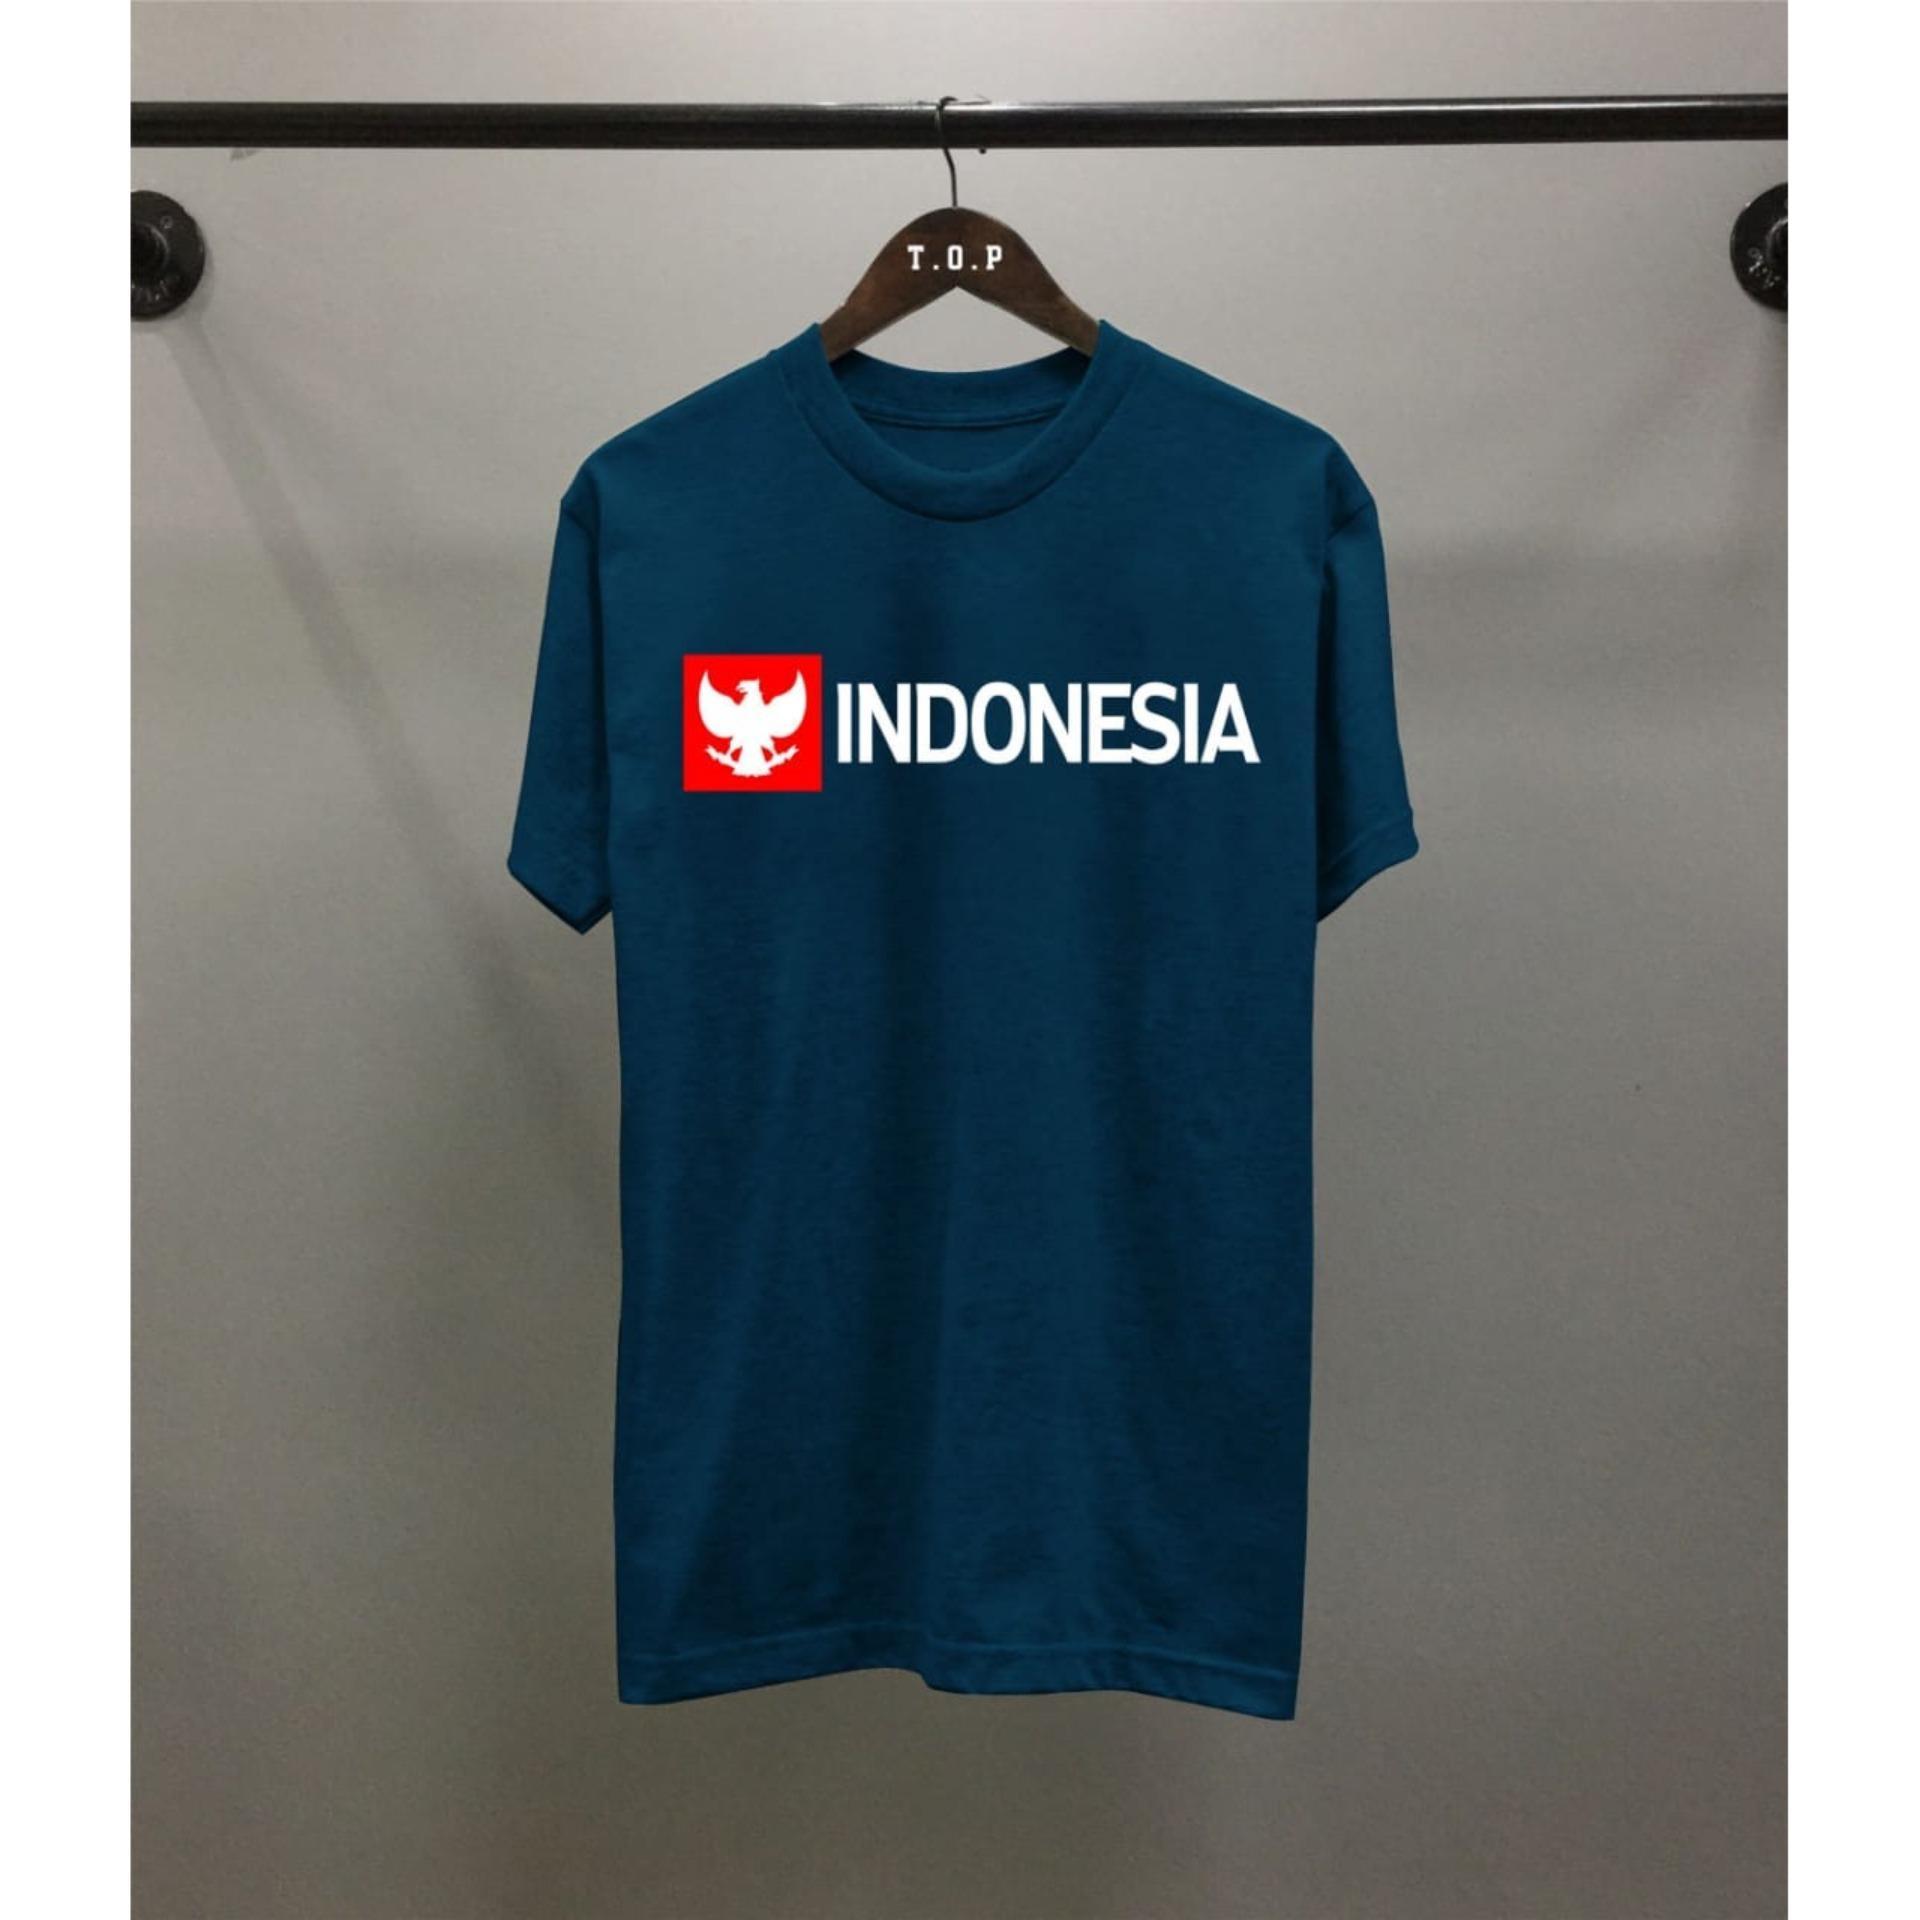 KAOS DISTRO / T-SHIRT PRIA DAN WANITA / KAOS 3D / KAOS DISTRO INDONESIA